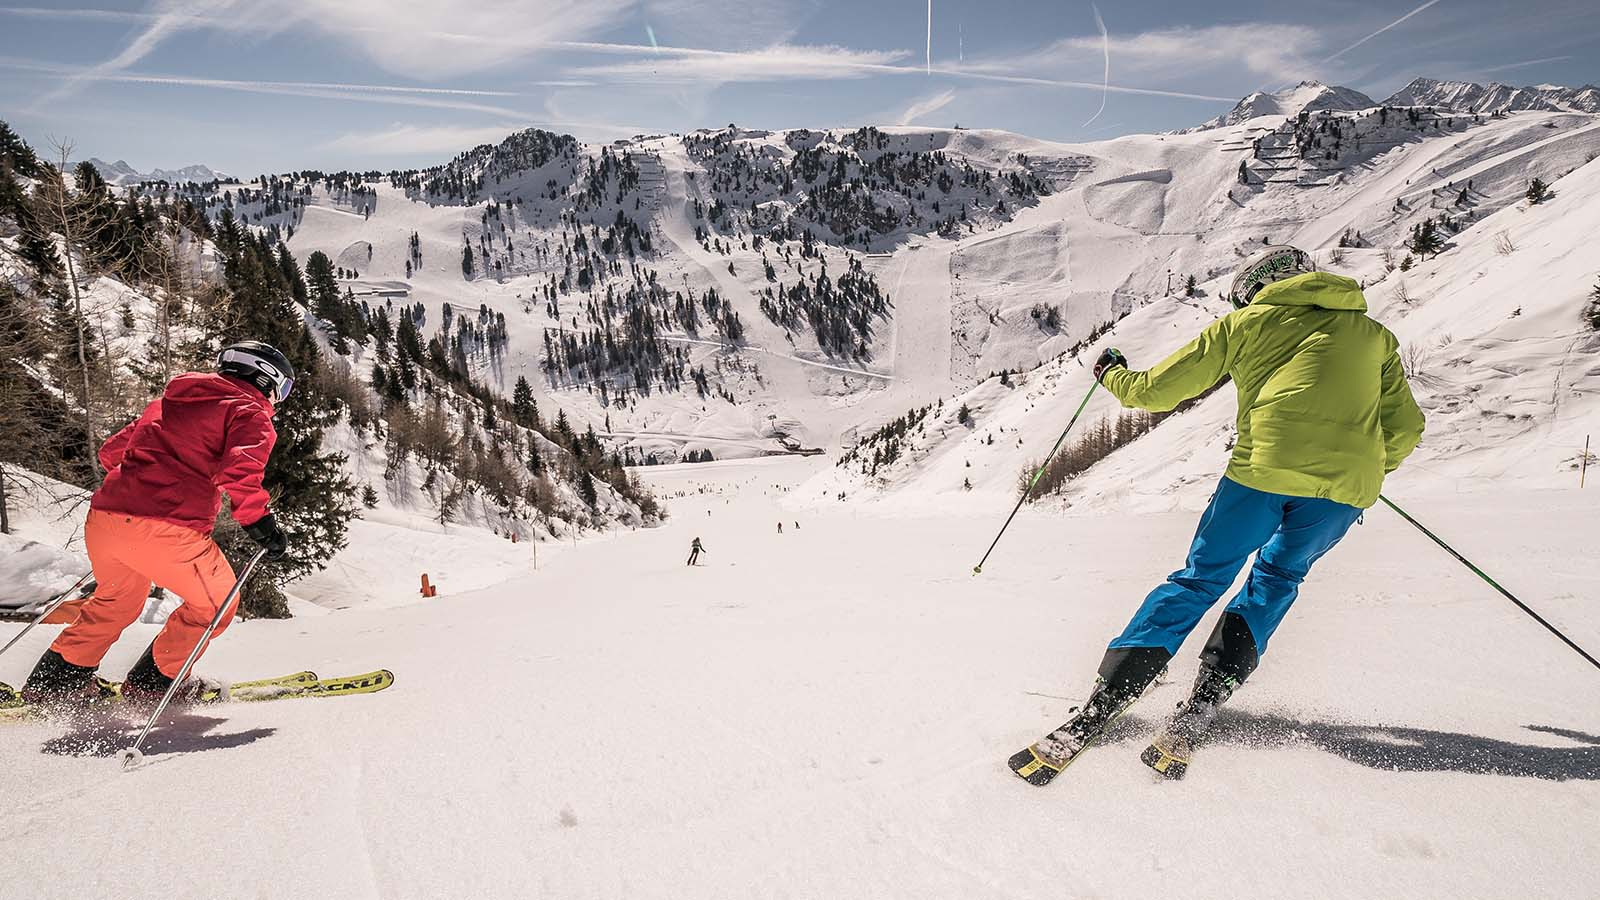 Winter Sking in Mayrhofen